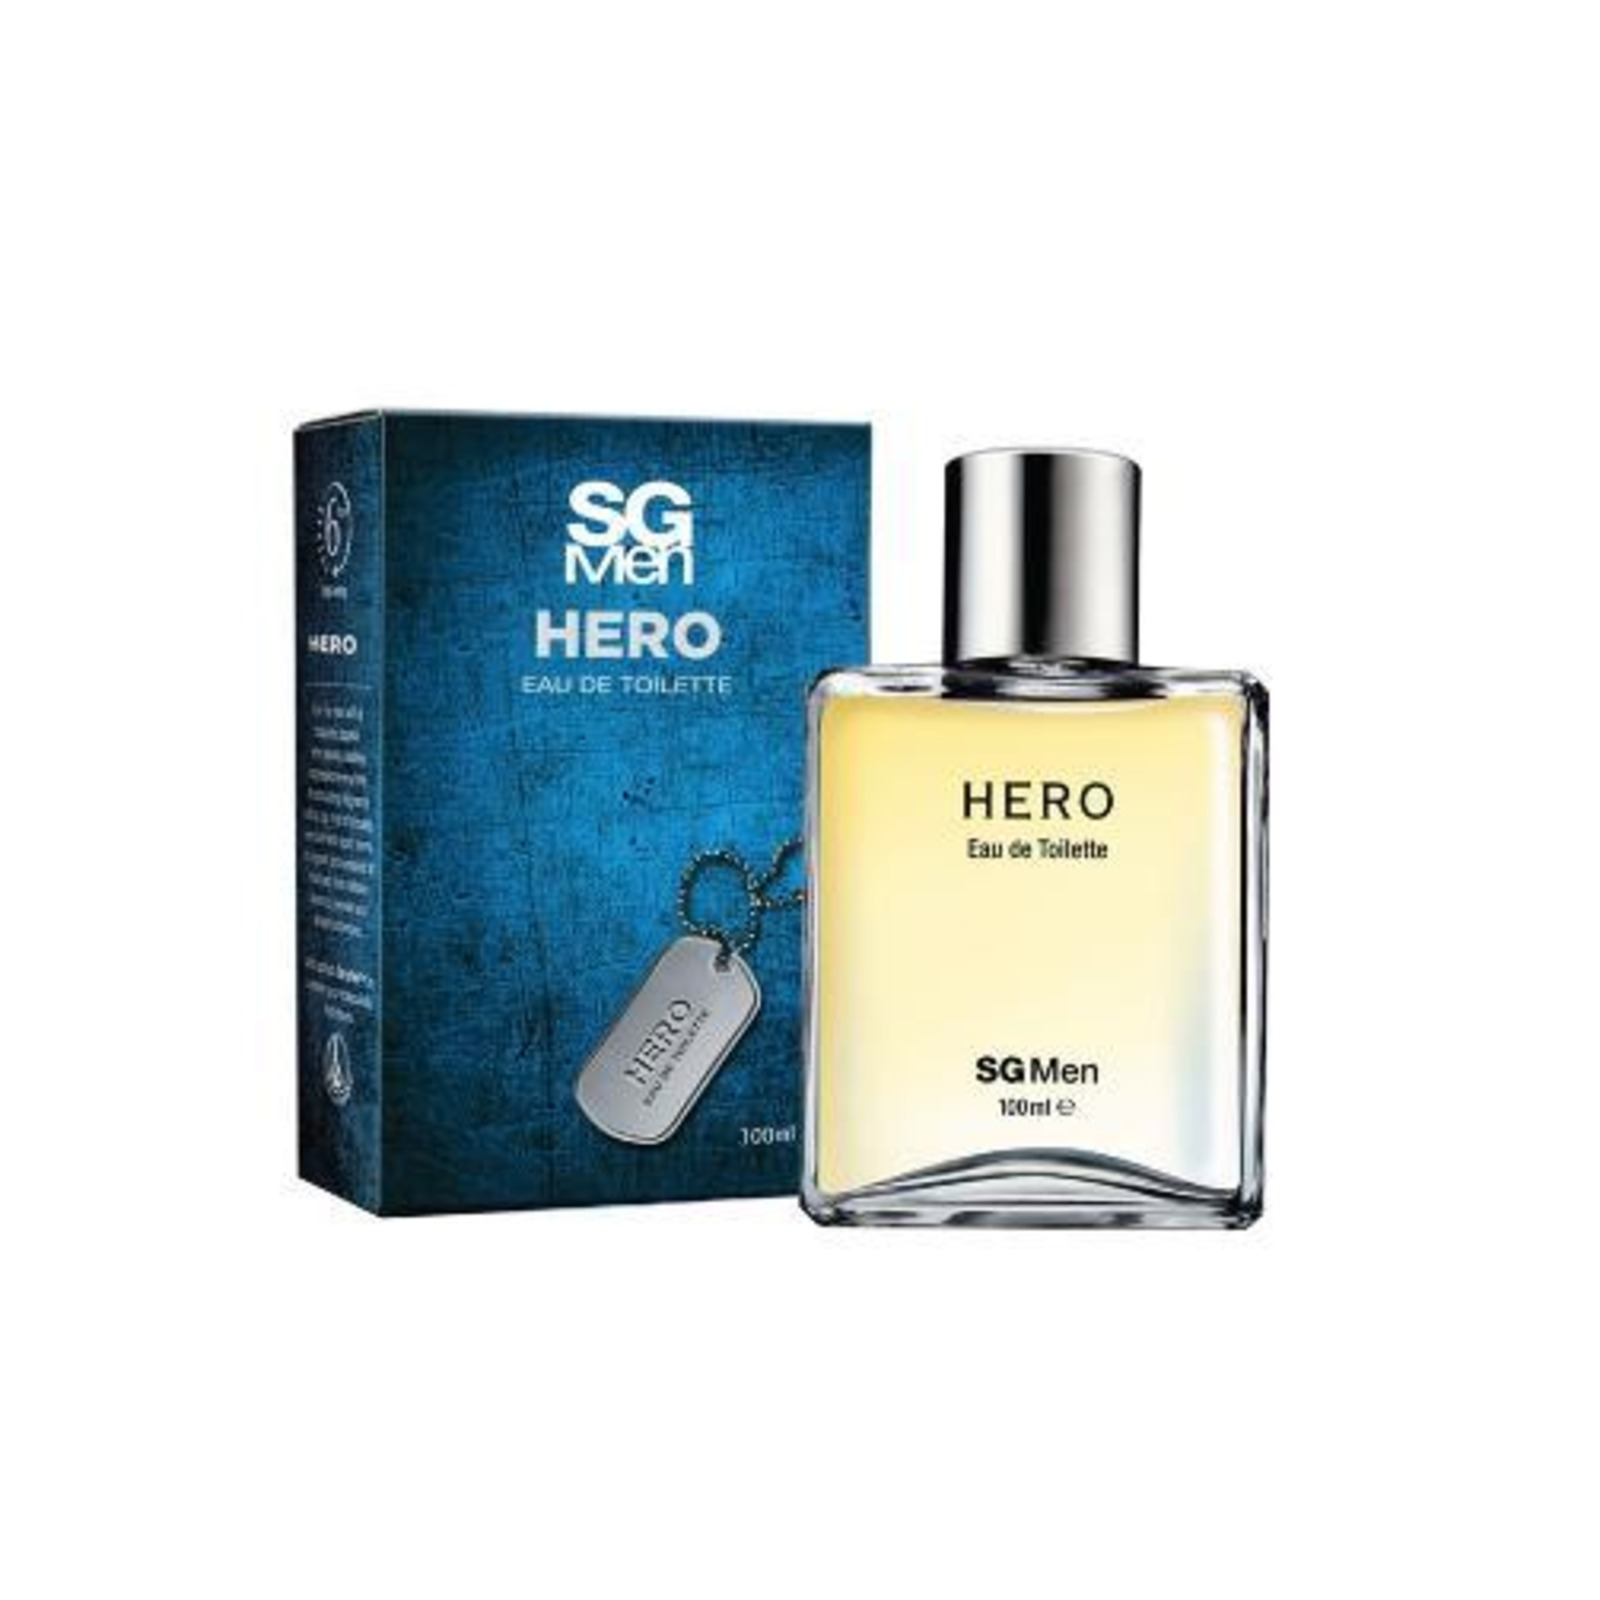 SilkyGirl Body Perfume - SG Men Hero Eau De Toilette